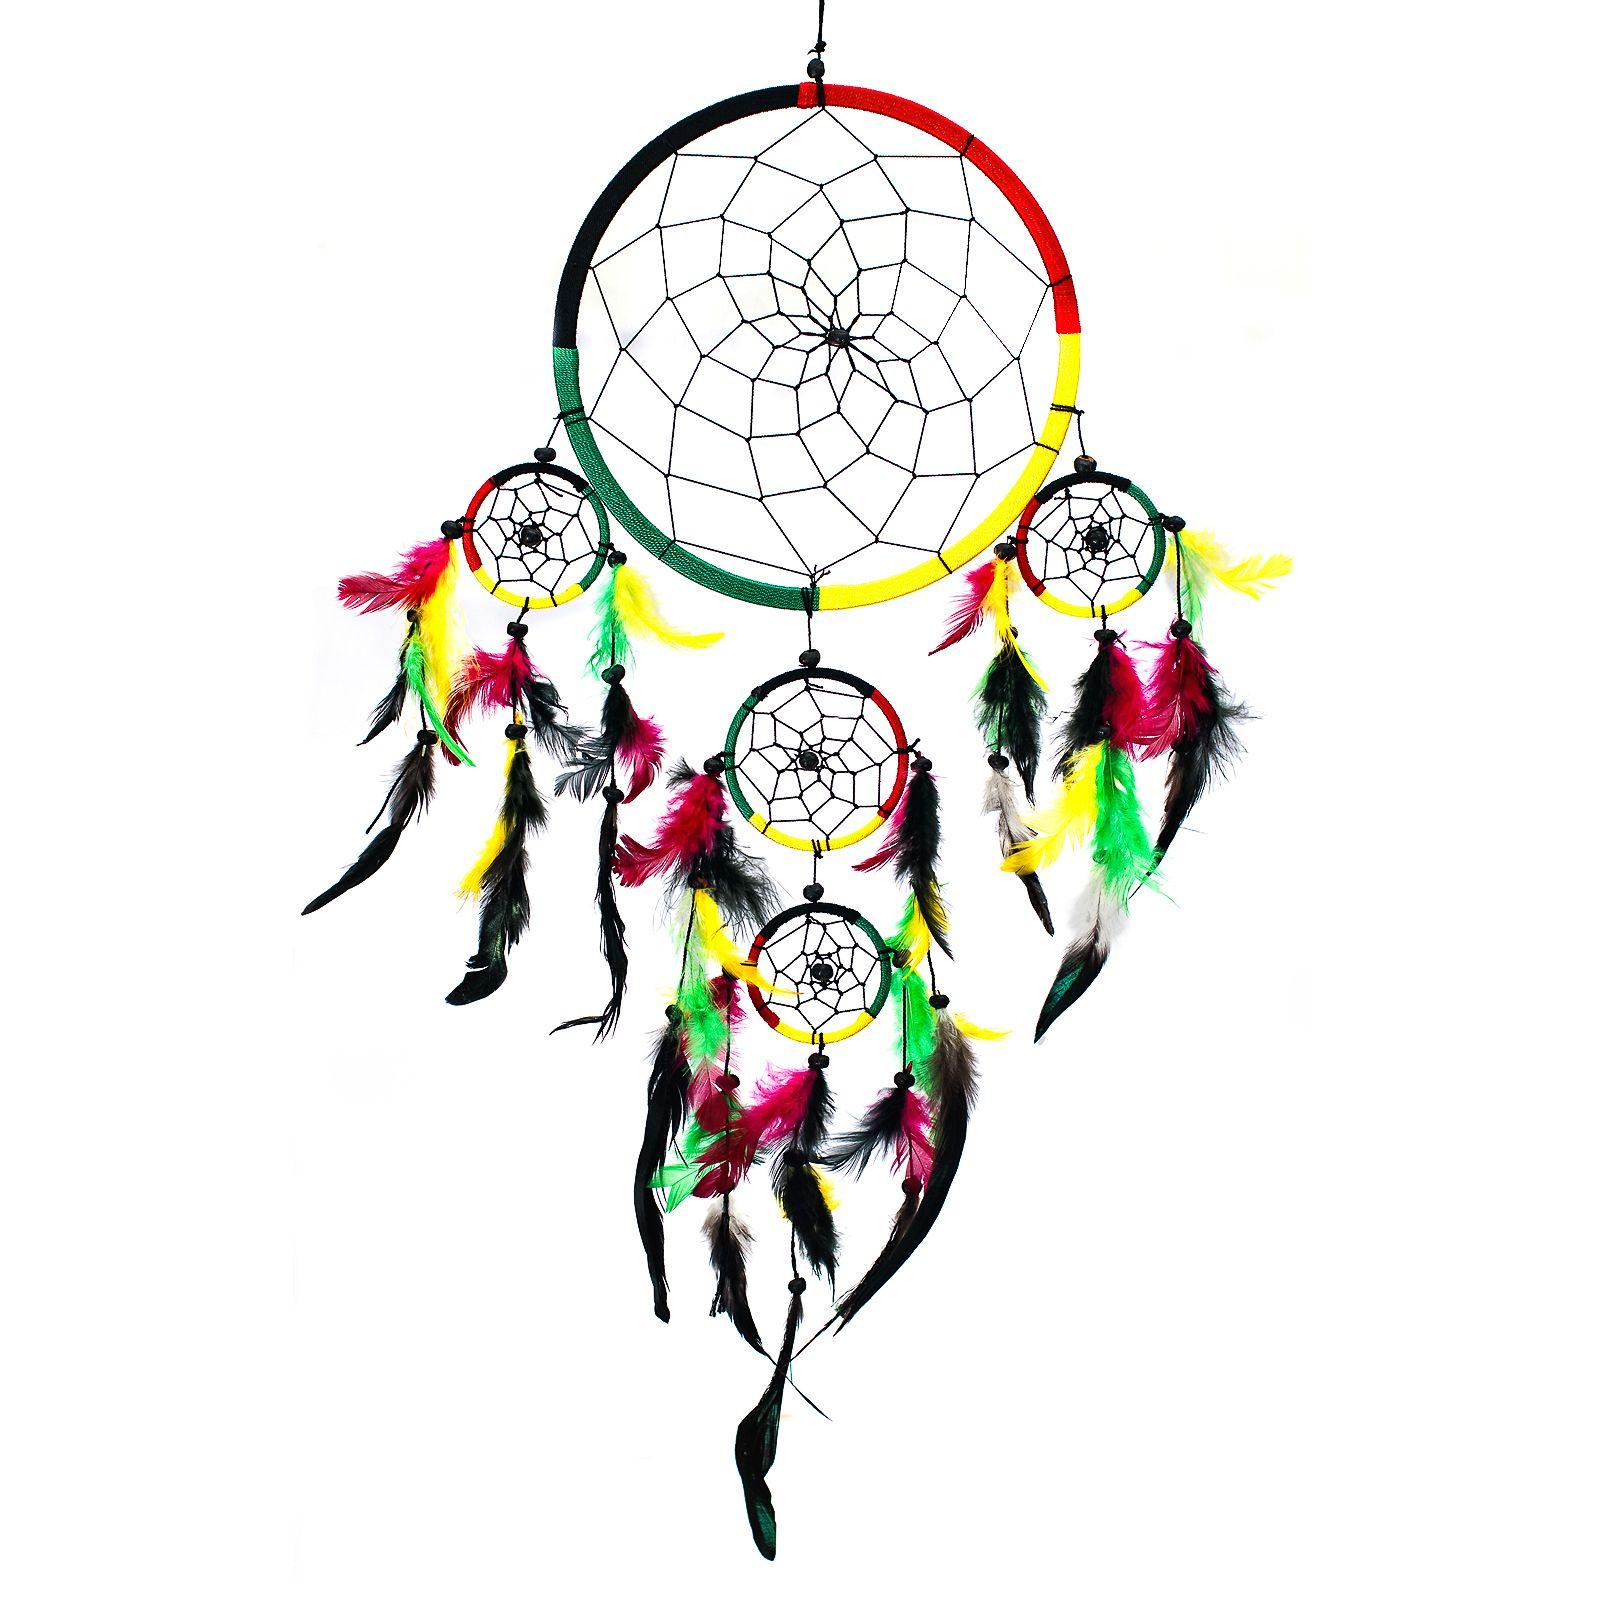 Color art dreamcatcher - Dream Catcher Traditional Shape Rasta 4 Color Black Green Red Yellow